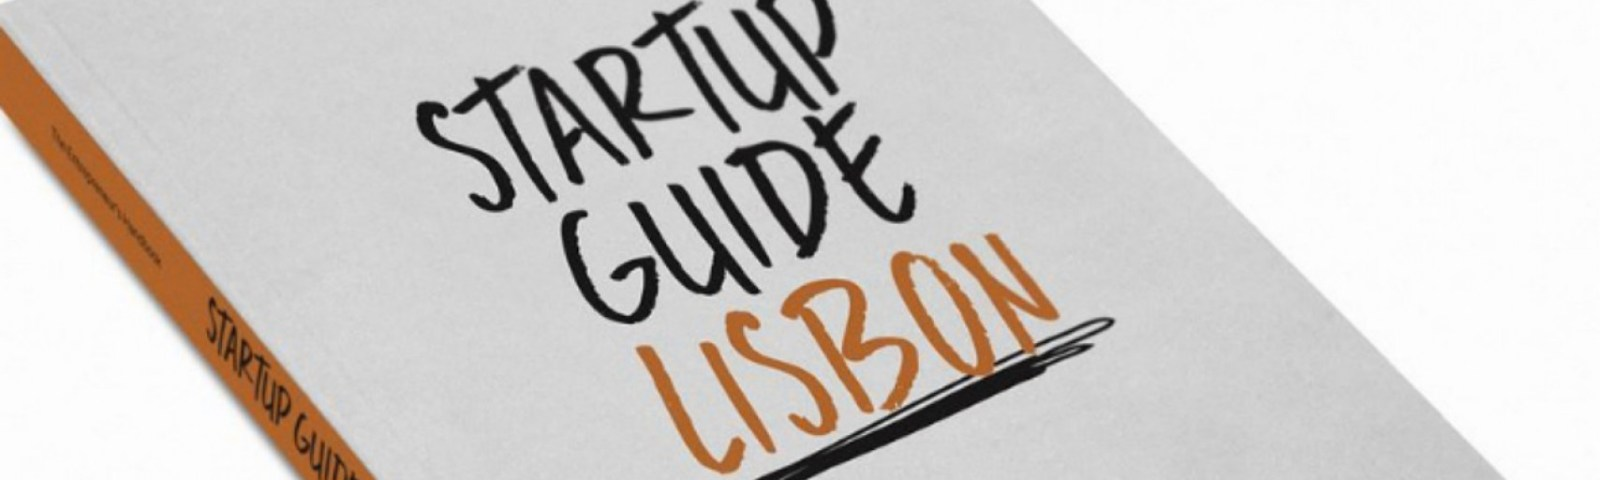 Guia para empreendedores